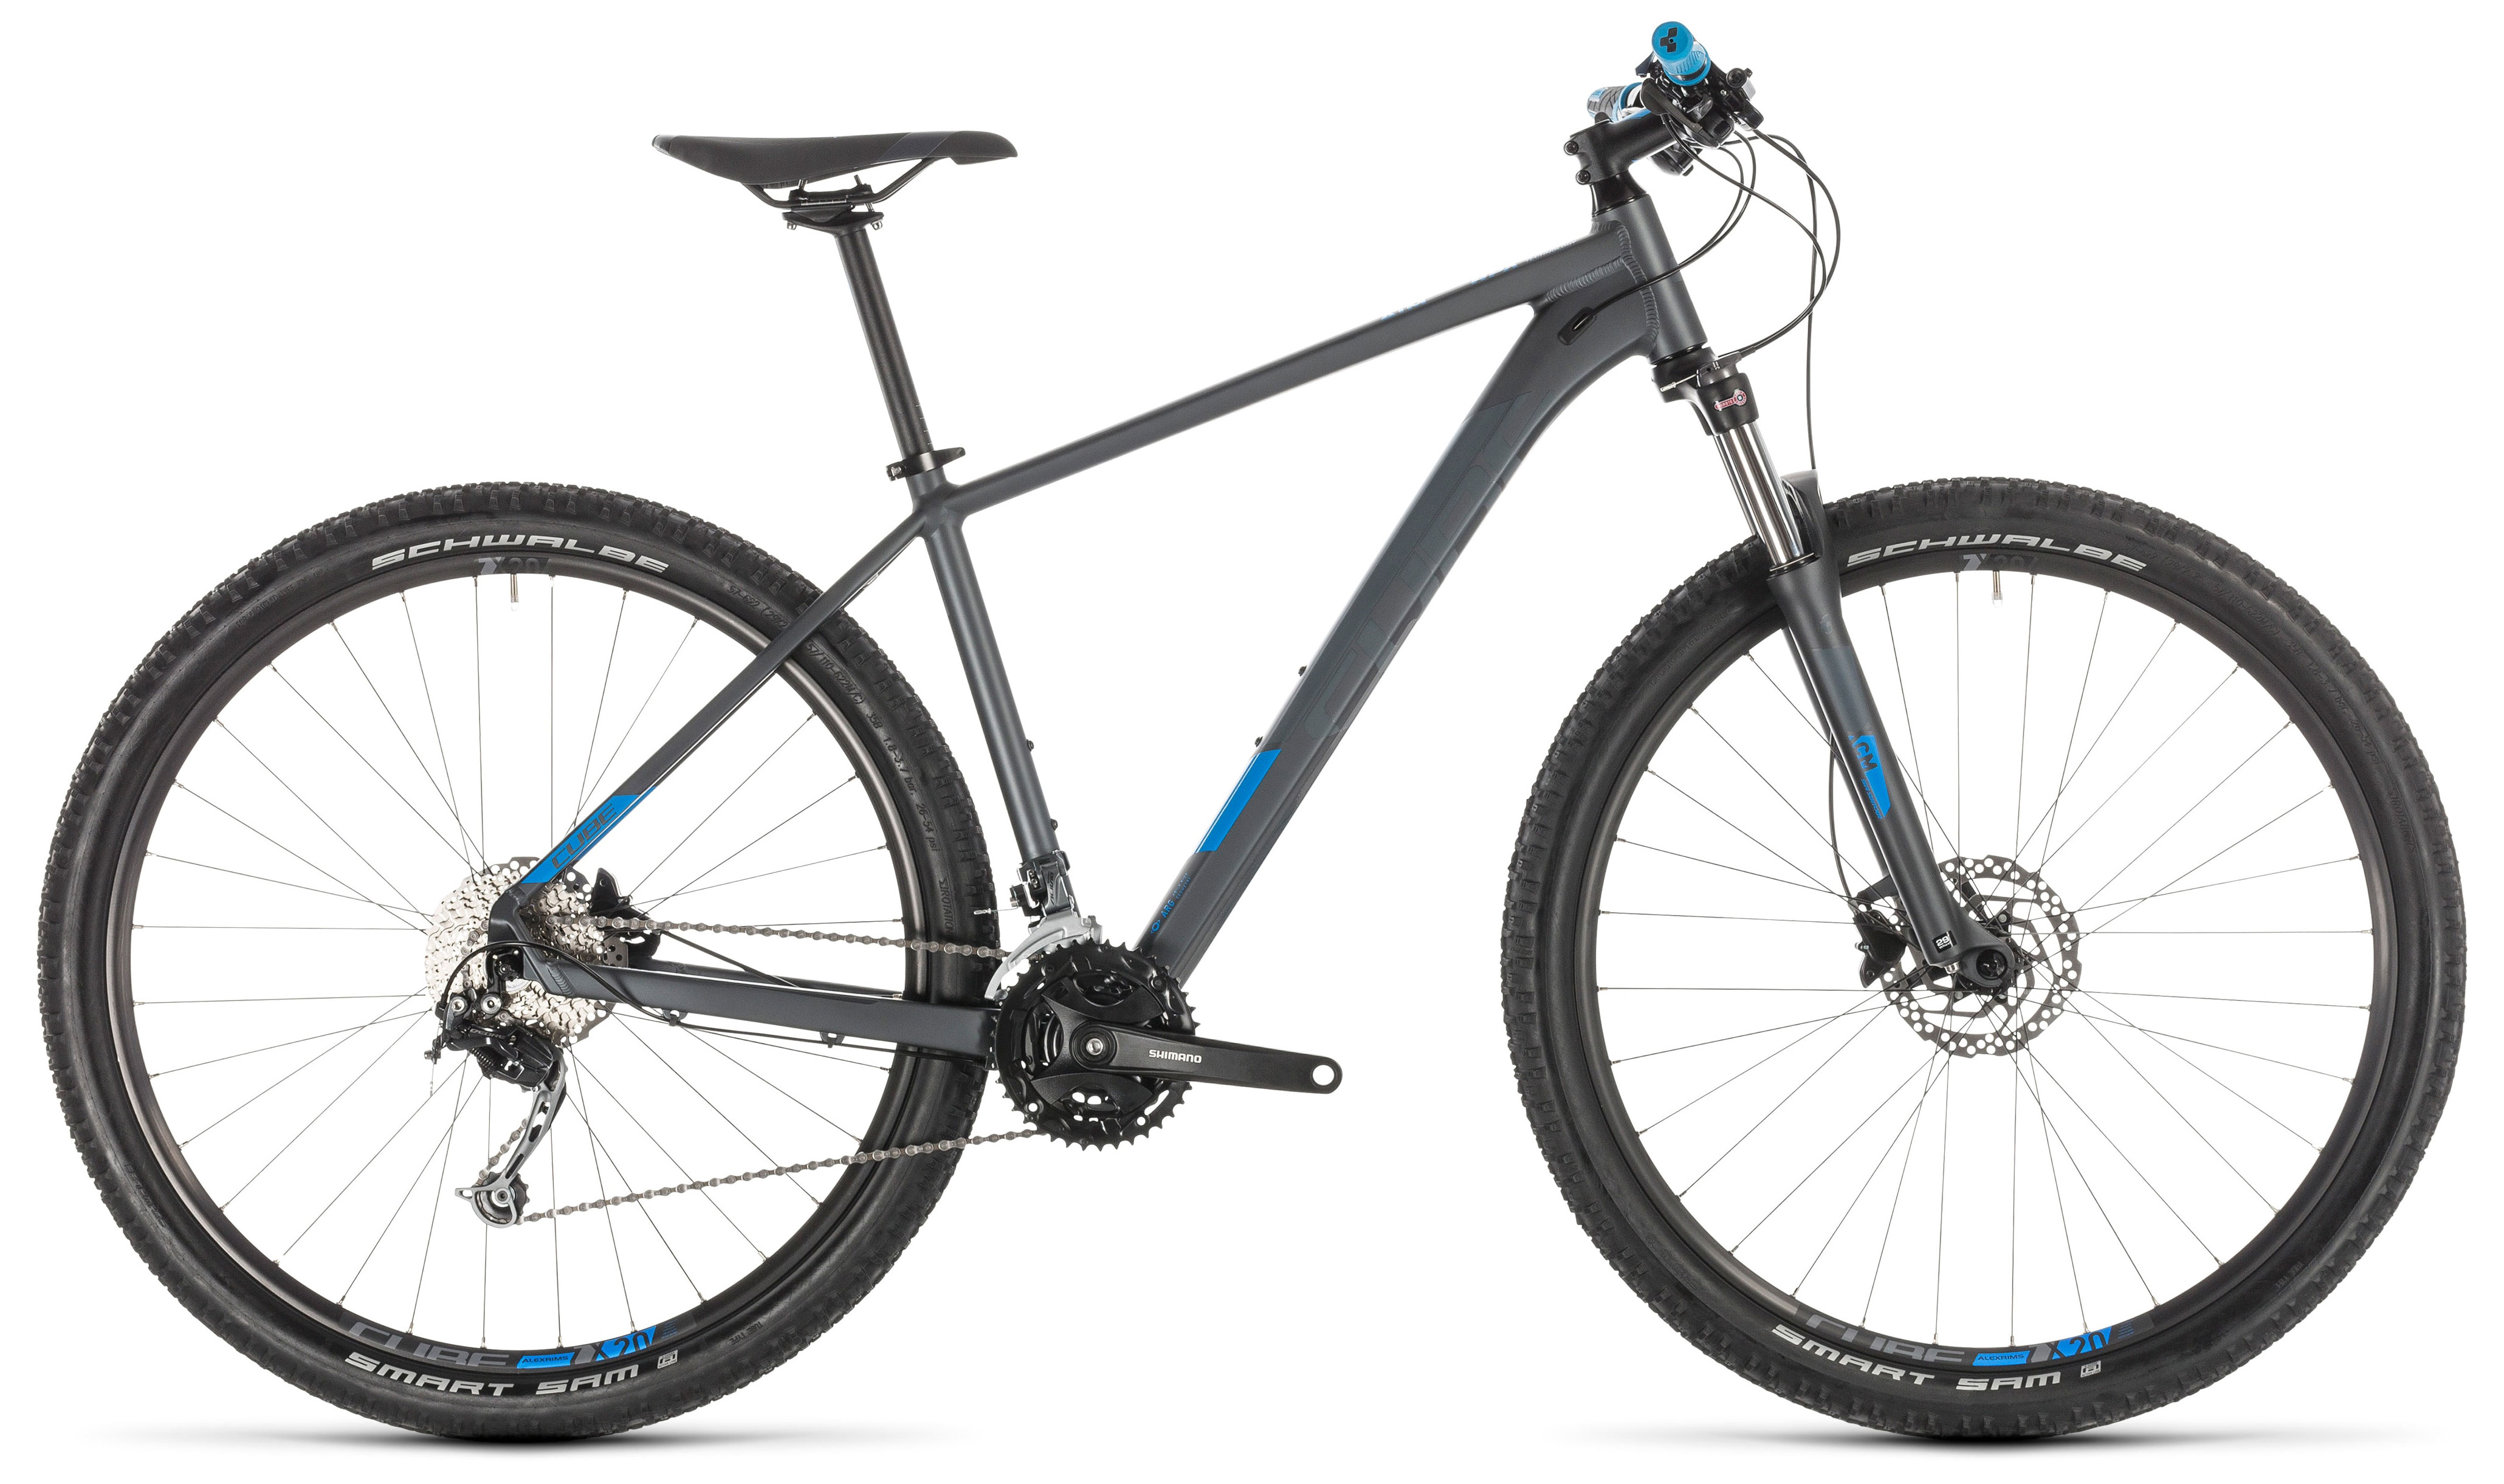 Велосипед Cube Aim SL 27.5 2019 велосипед cube stereo hybrid 140 sl 27 5 2014